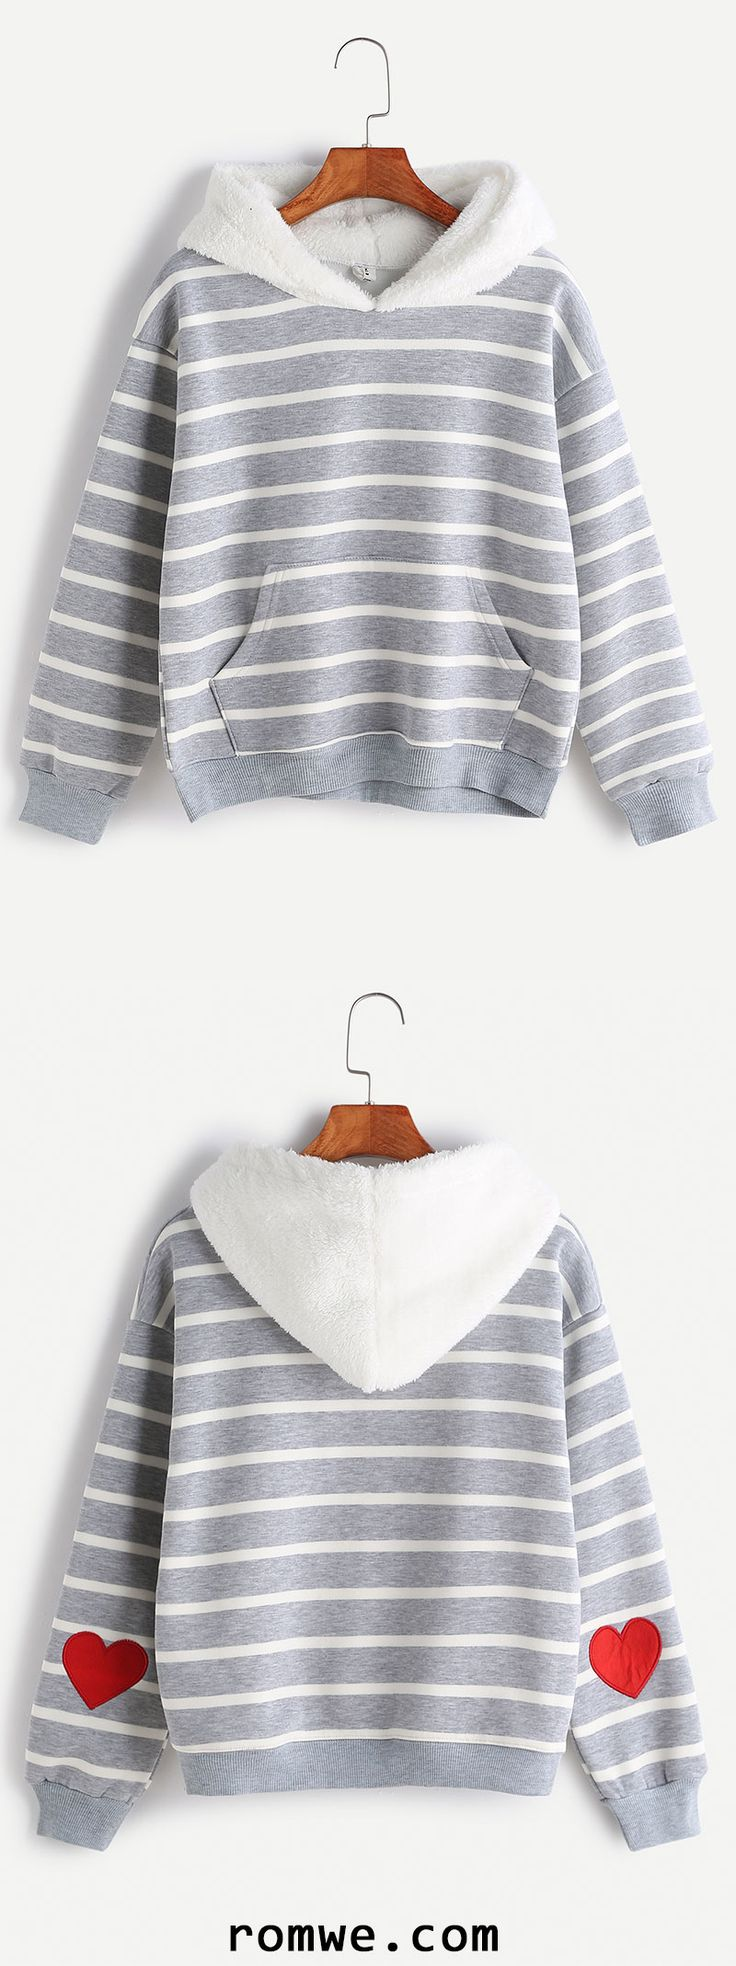 Striped Sleeve Heart Patch Pocket Sweatshirt With Fuzzy